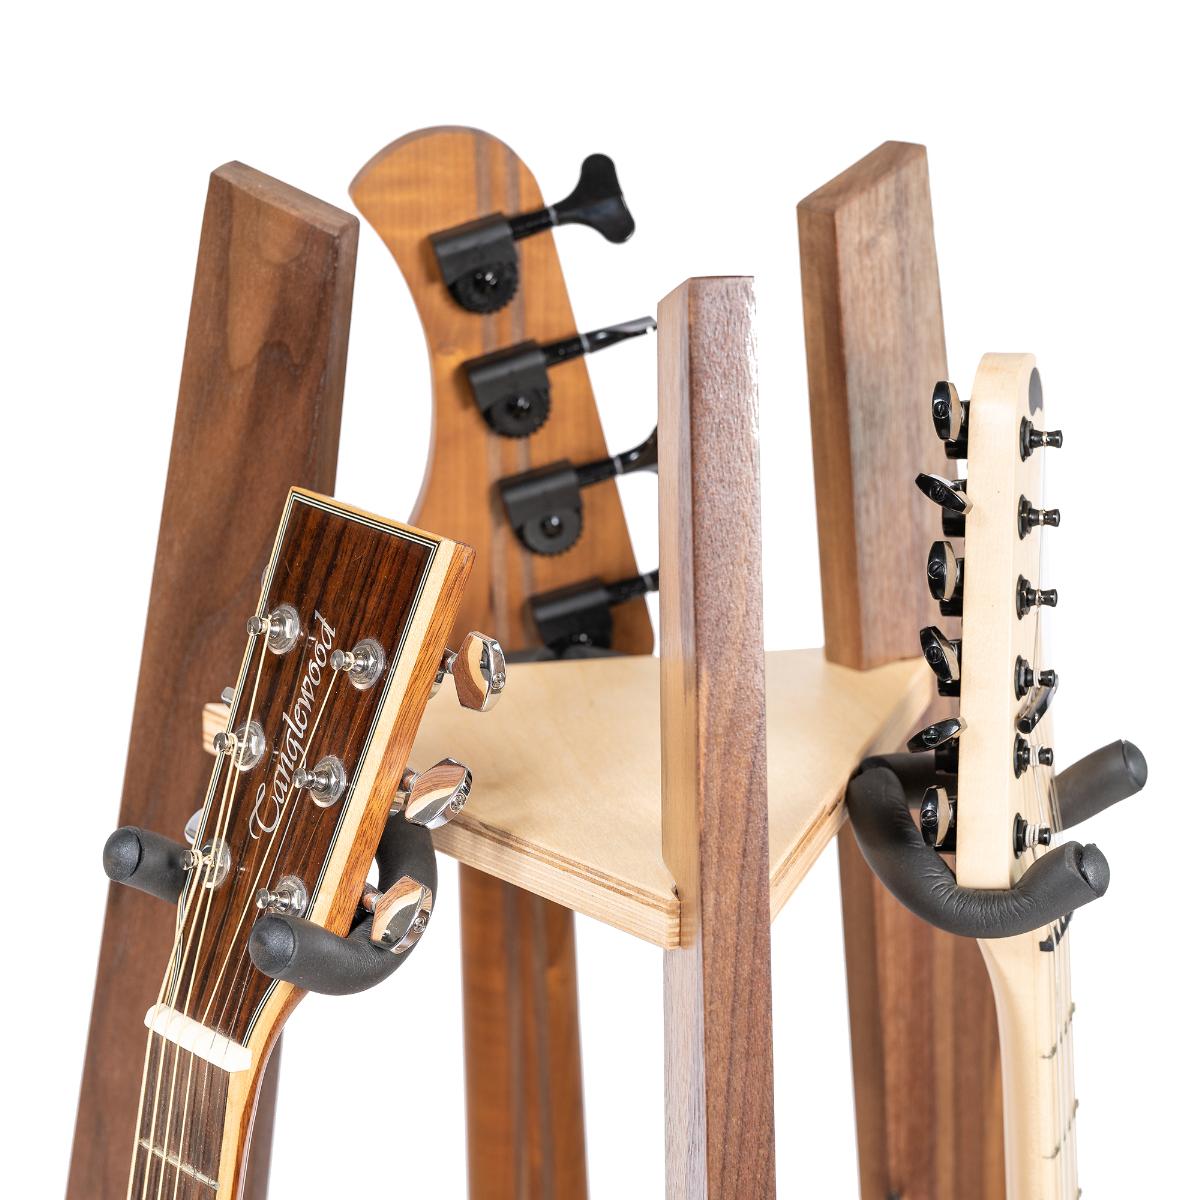 Ruach_Guitar_3Stand_Walnut_4